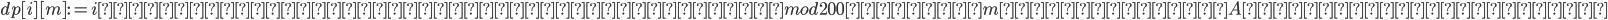 \displaystyle dp[i][m]:=i番目の要素までを使って作れる、mod 200の値がmである集合Aの部分集合の個数